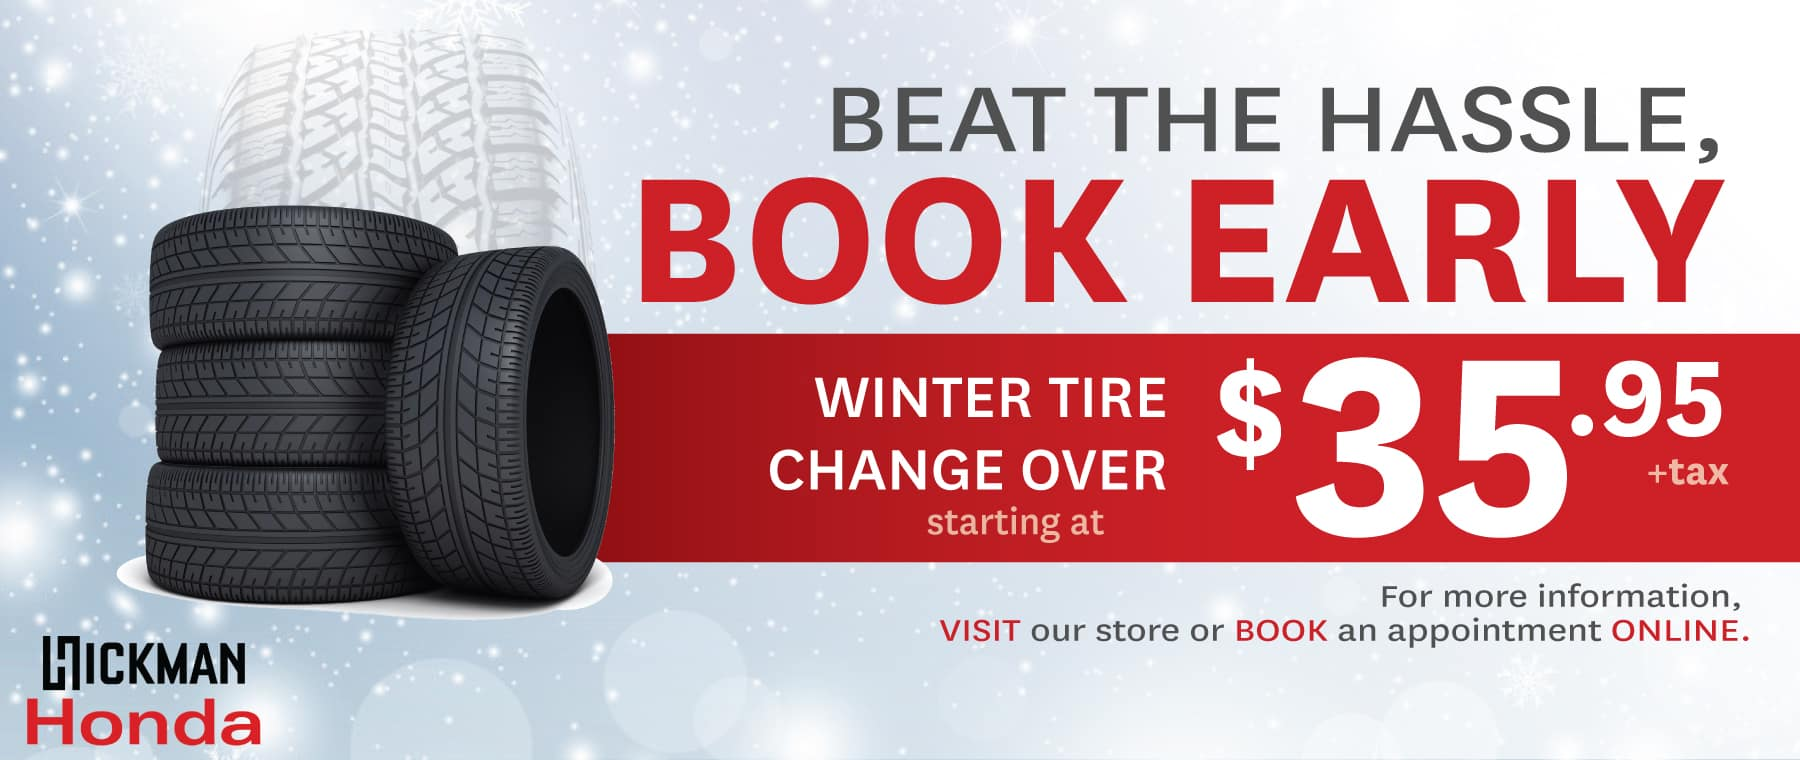 Winter-Tire-Change-Over-2021—Honda—Desktop